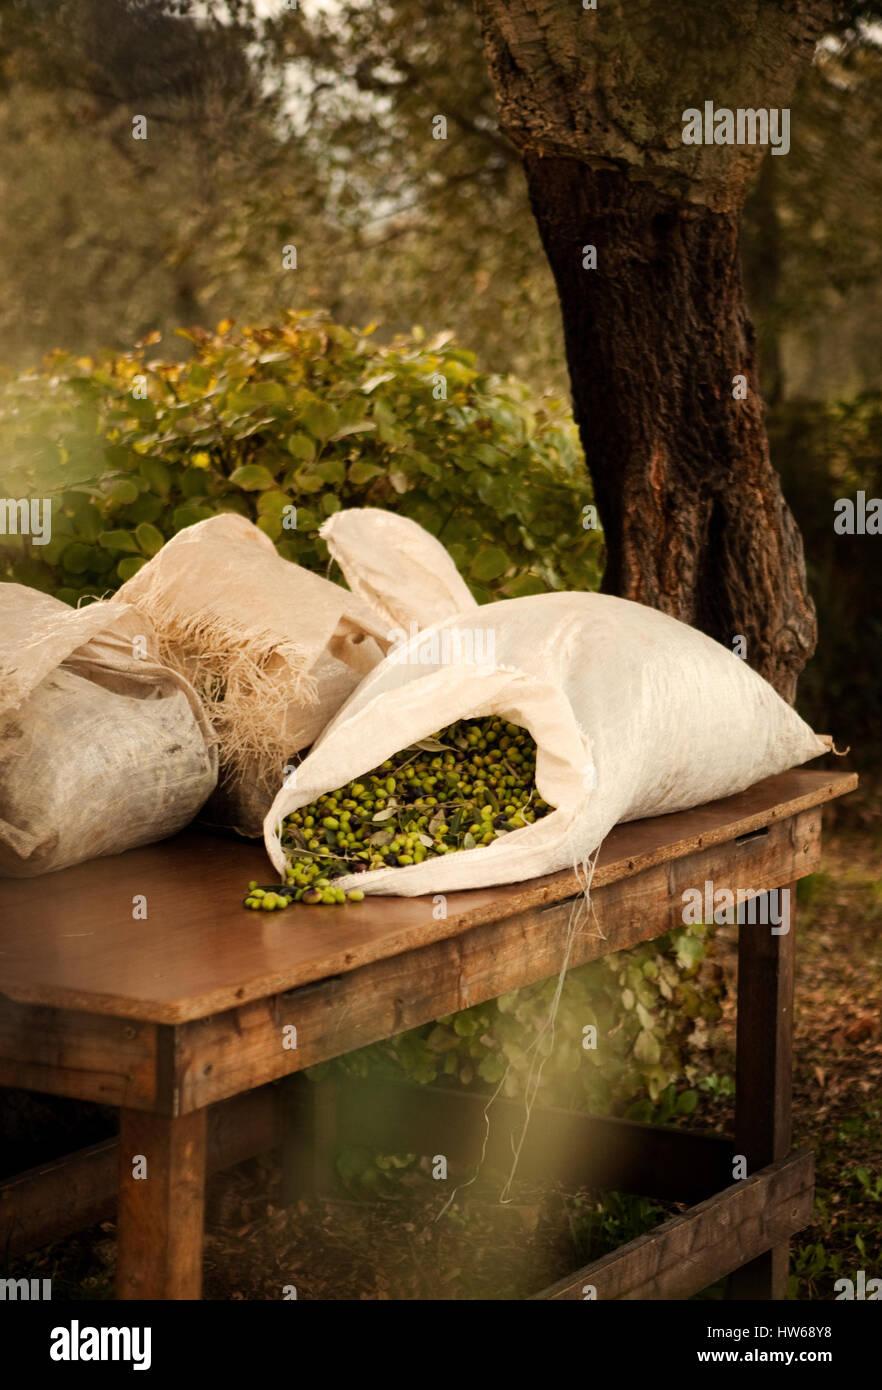 Olives - Stock Image